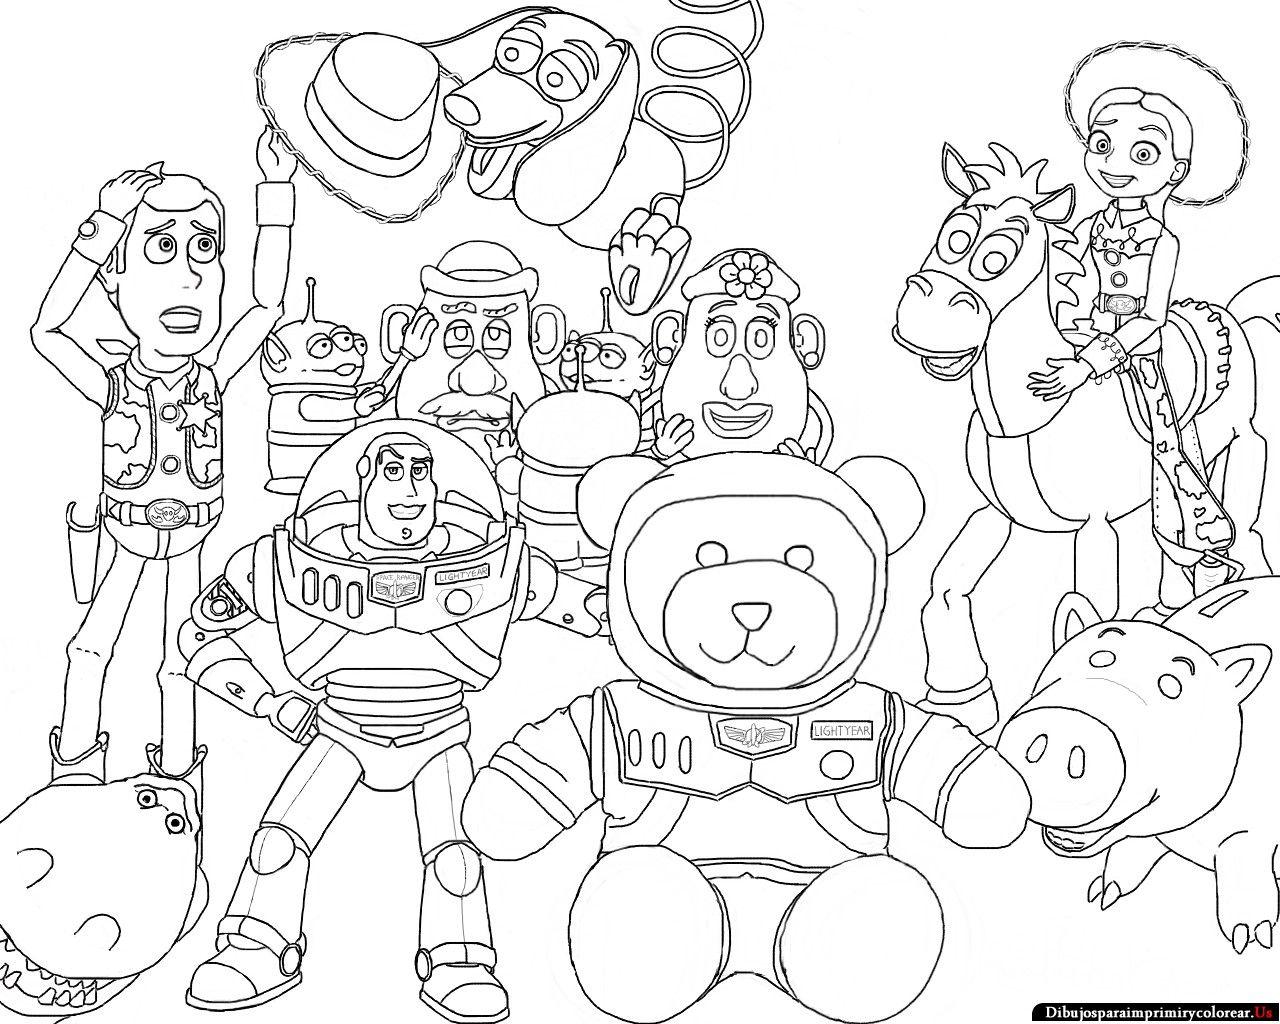 Toy Story 3 Dibujos Para Pintar - Dibujos Para Pintar